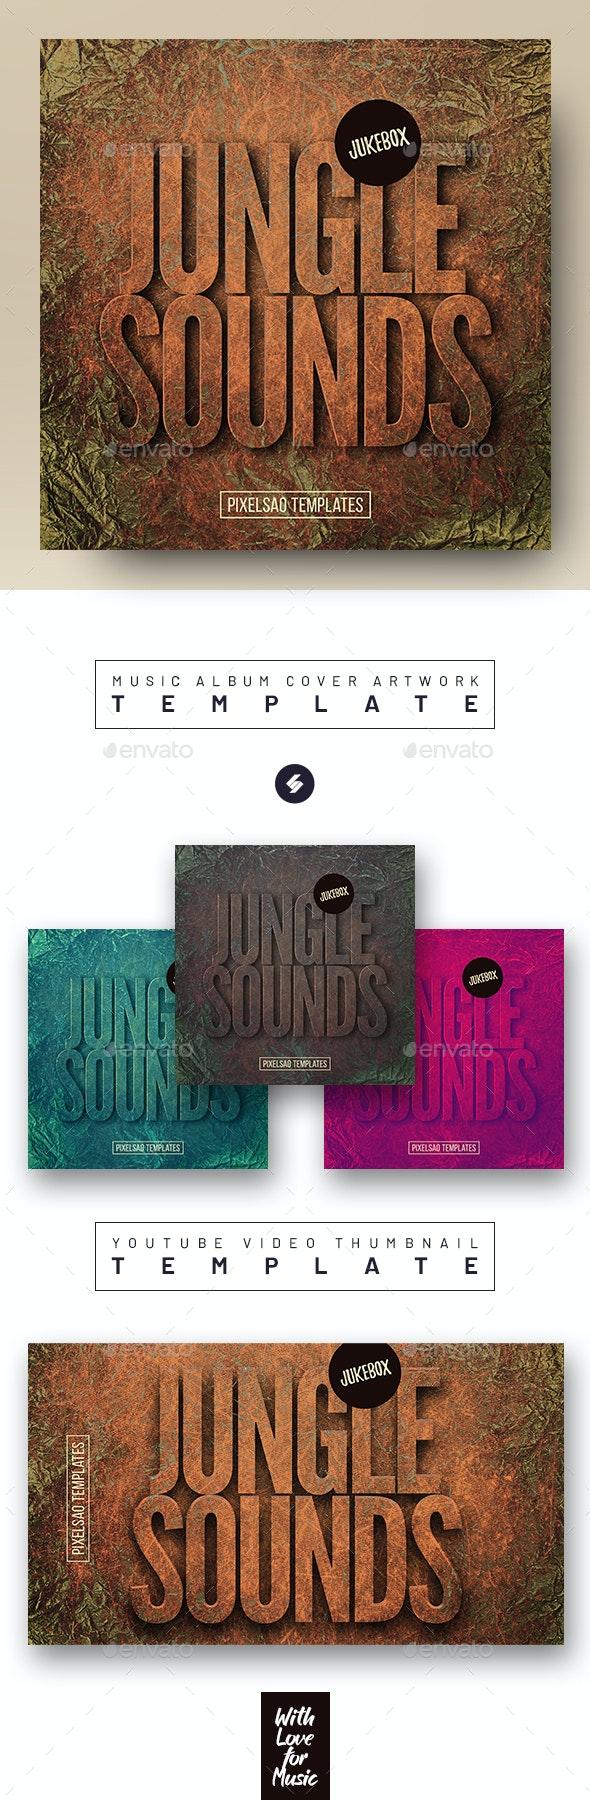 Jungle Sounds – Music Album Cover Artwork / Youtube Thumbnail Template - Miscellaneous Social Media